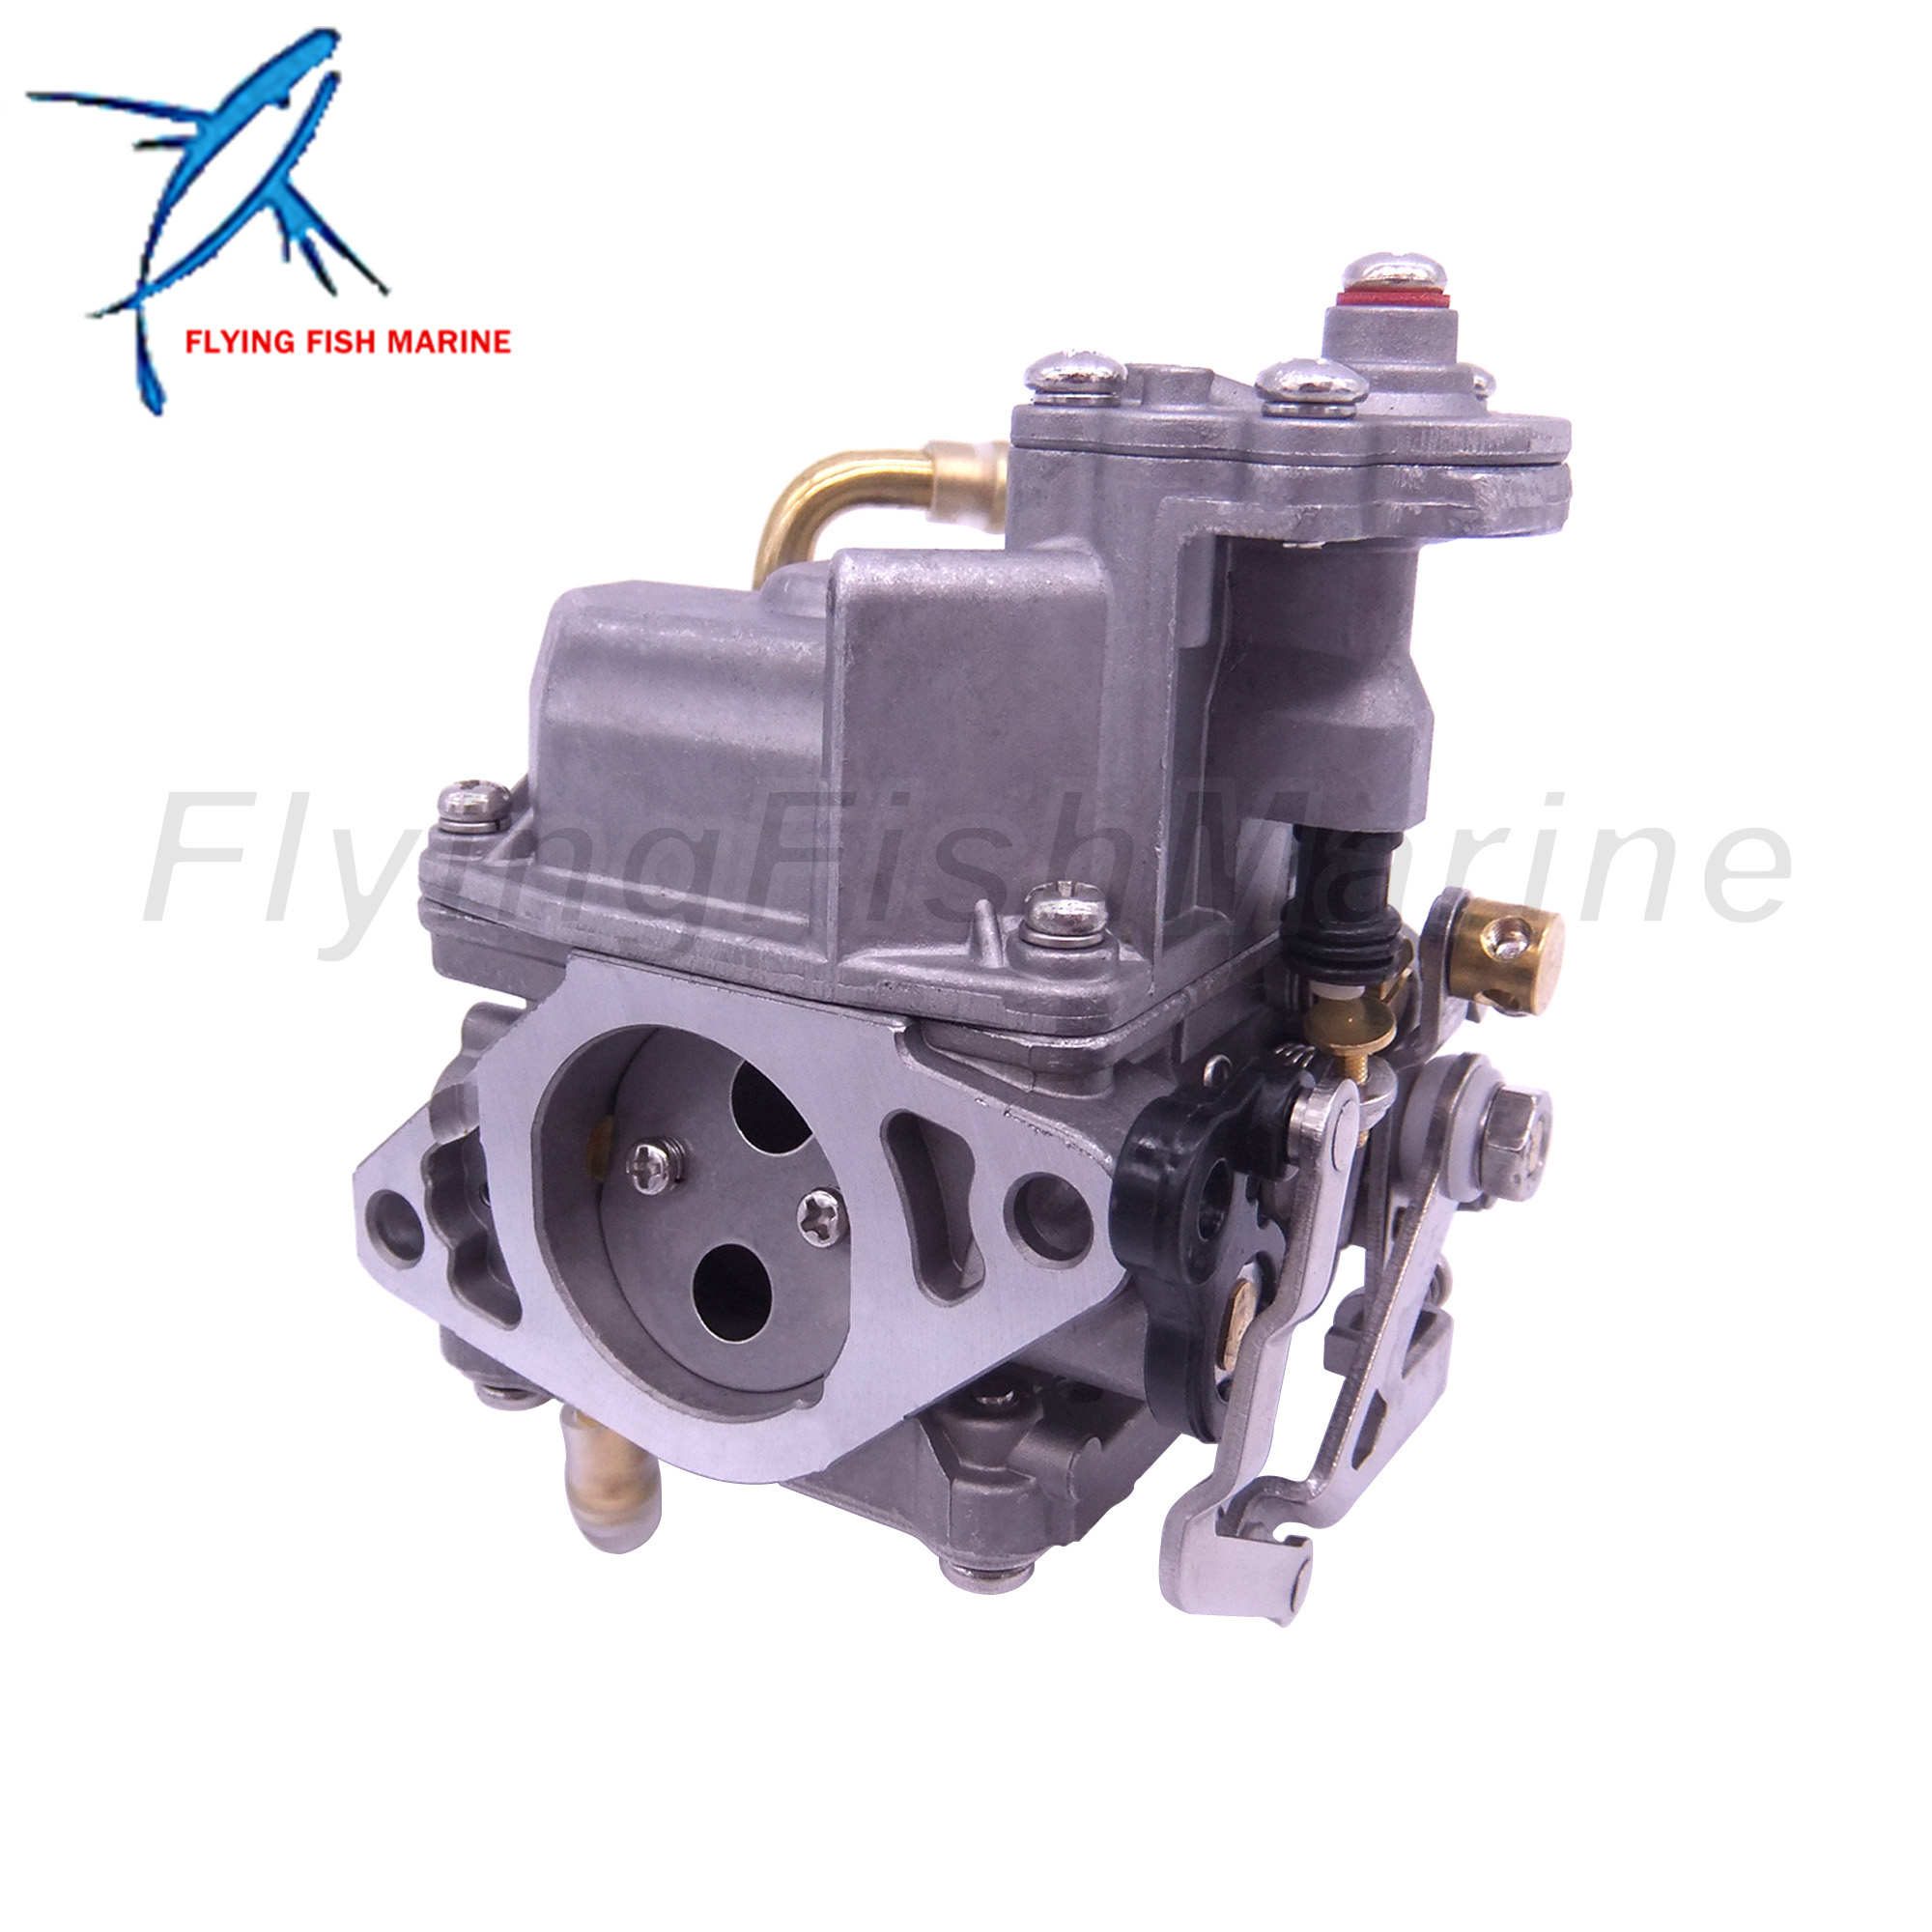 Outboard Engine 5040597 Carburetor Assembly For Evinrude Johnson OMC Boat Motor 4-stroke 15HP